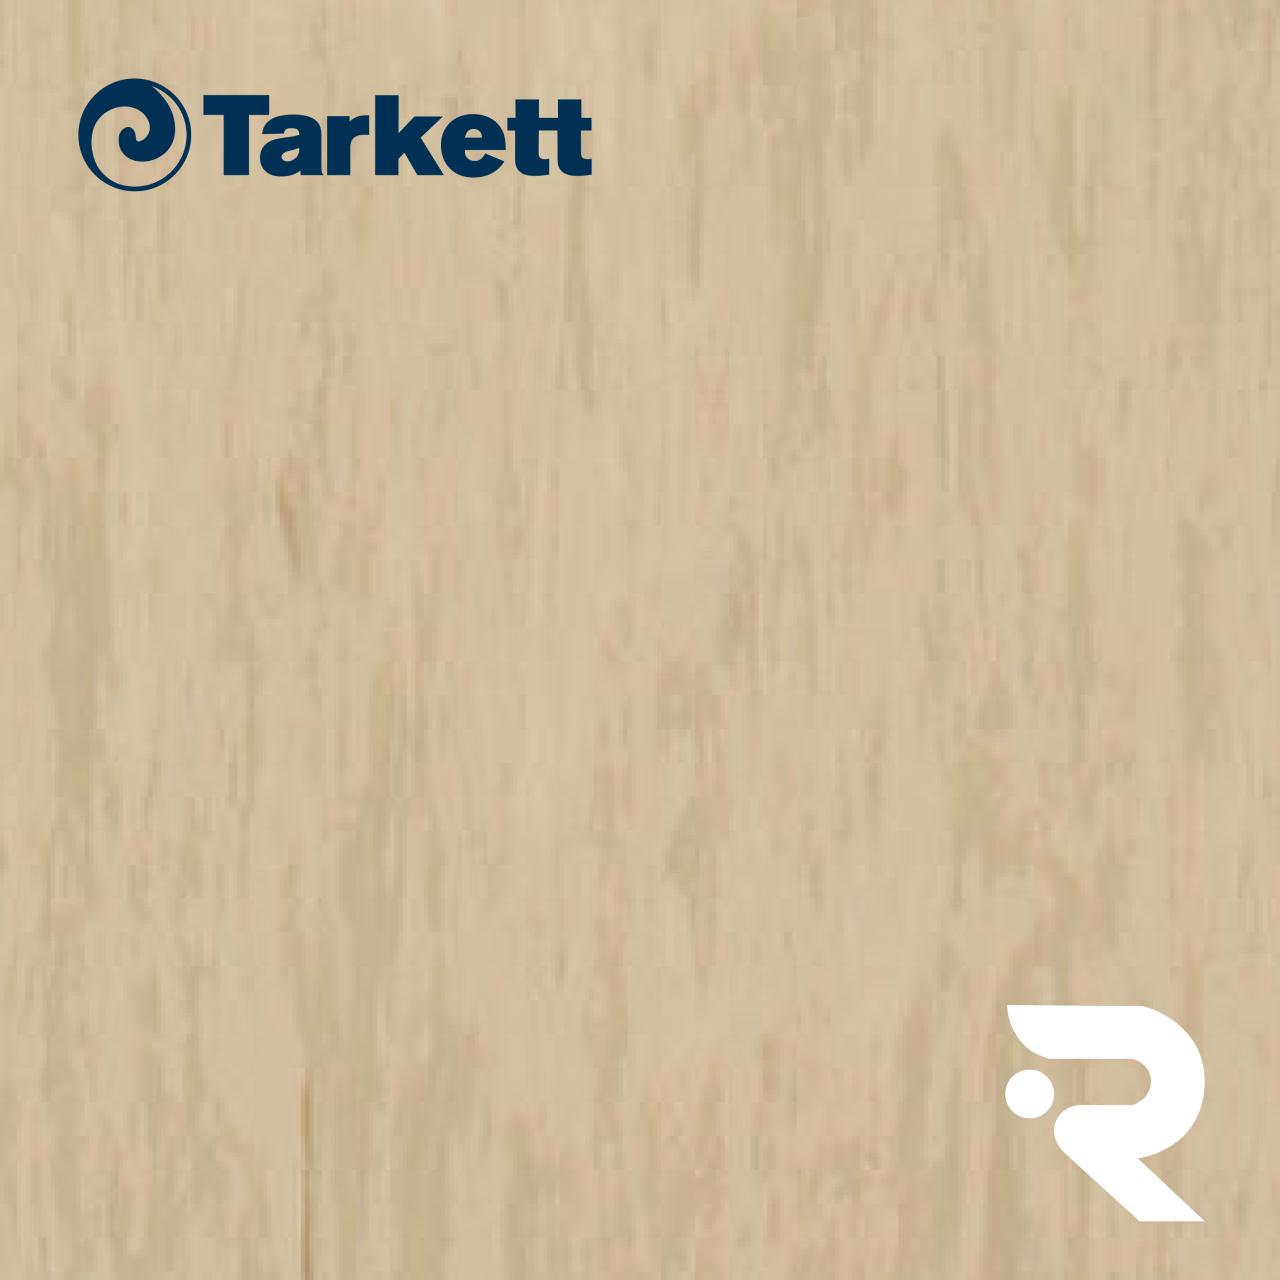 🏫 Гомогенный линолеум Tarkett   Standard LIGHT YELLOW BEIGE 0483   Standard Plus 2.0 mm   2 х 23 м